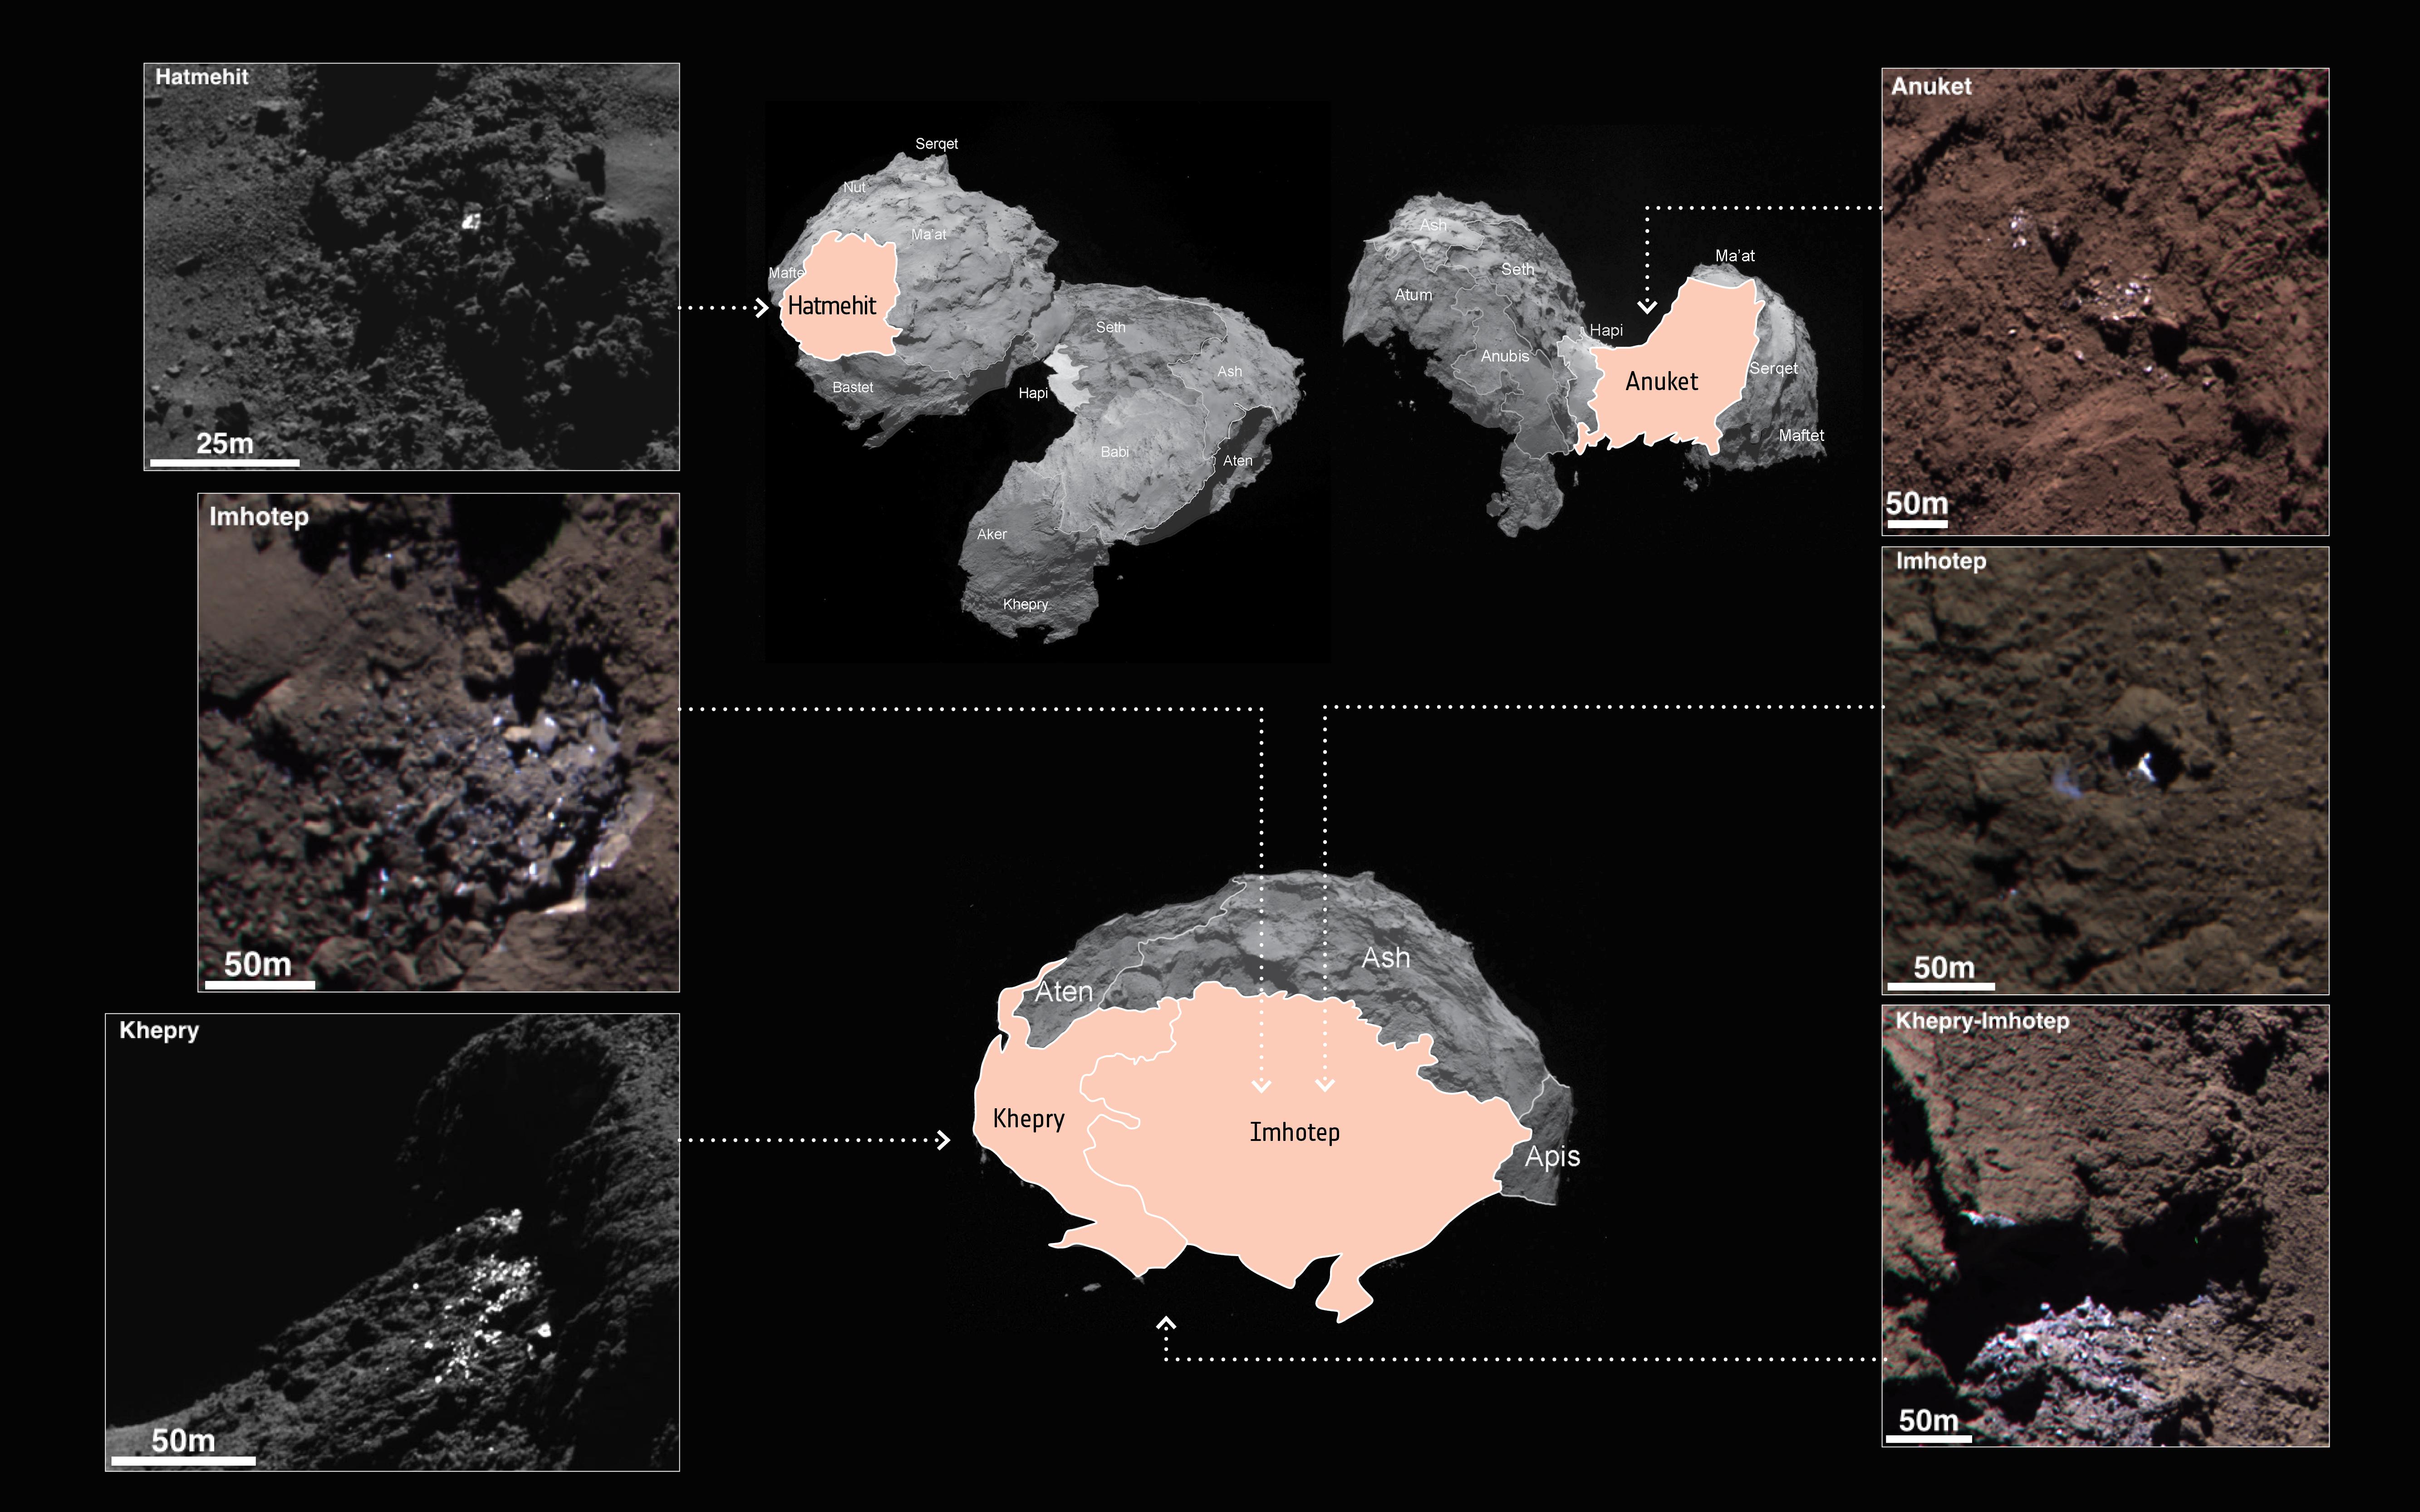 Ice_on_Comet_67P_Churyumov-Gerasimenko